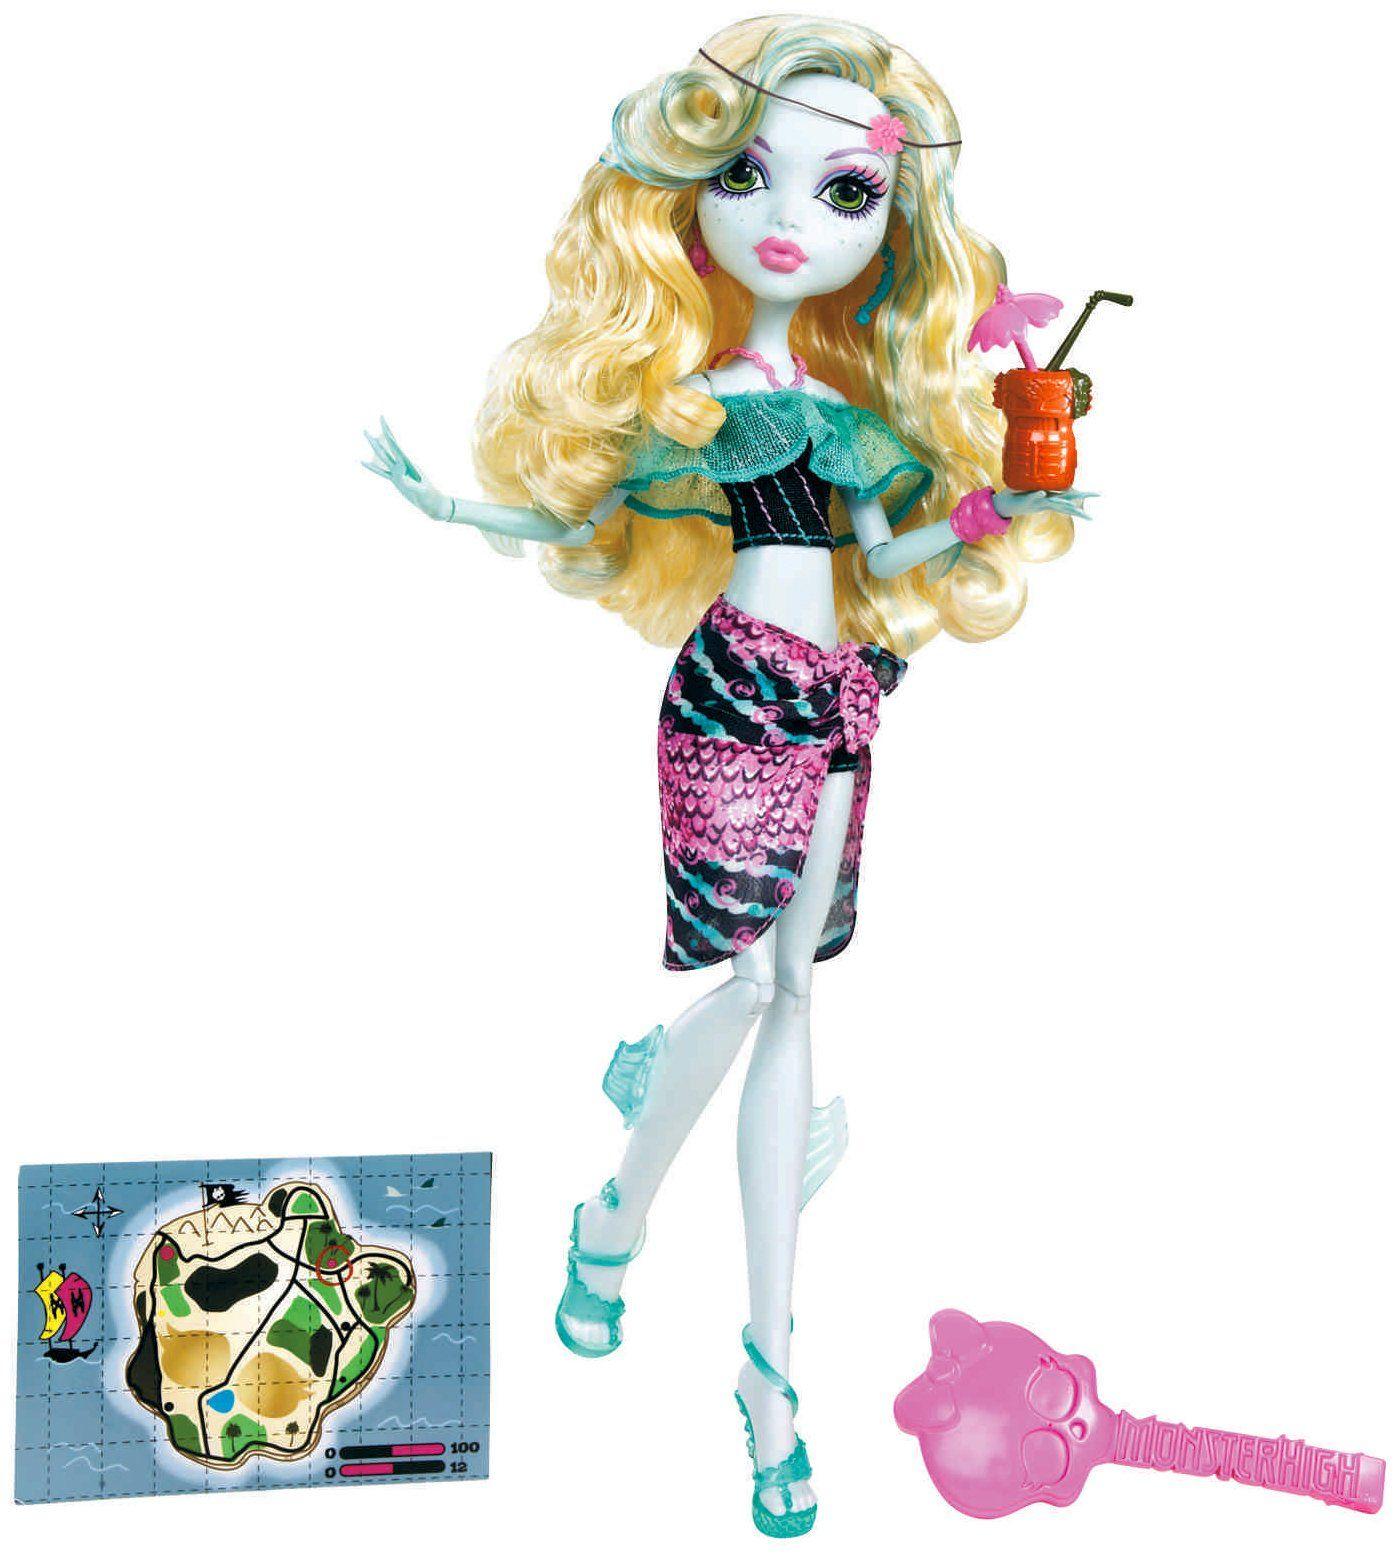 monster high skull shores lagoona blue doll free shipping alexa wish list pinterest. Black Bedroom Furniture Sets. Home Design Ideas